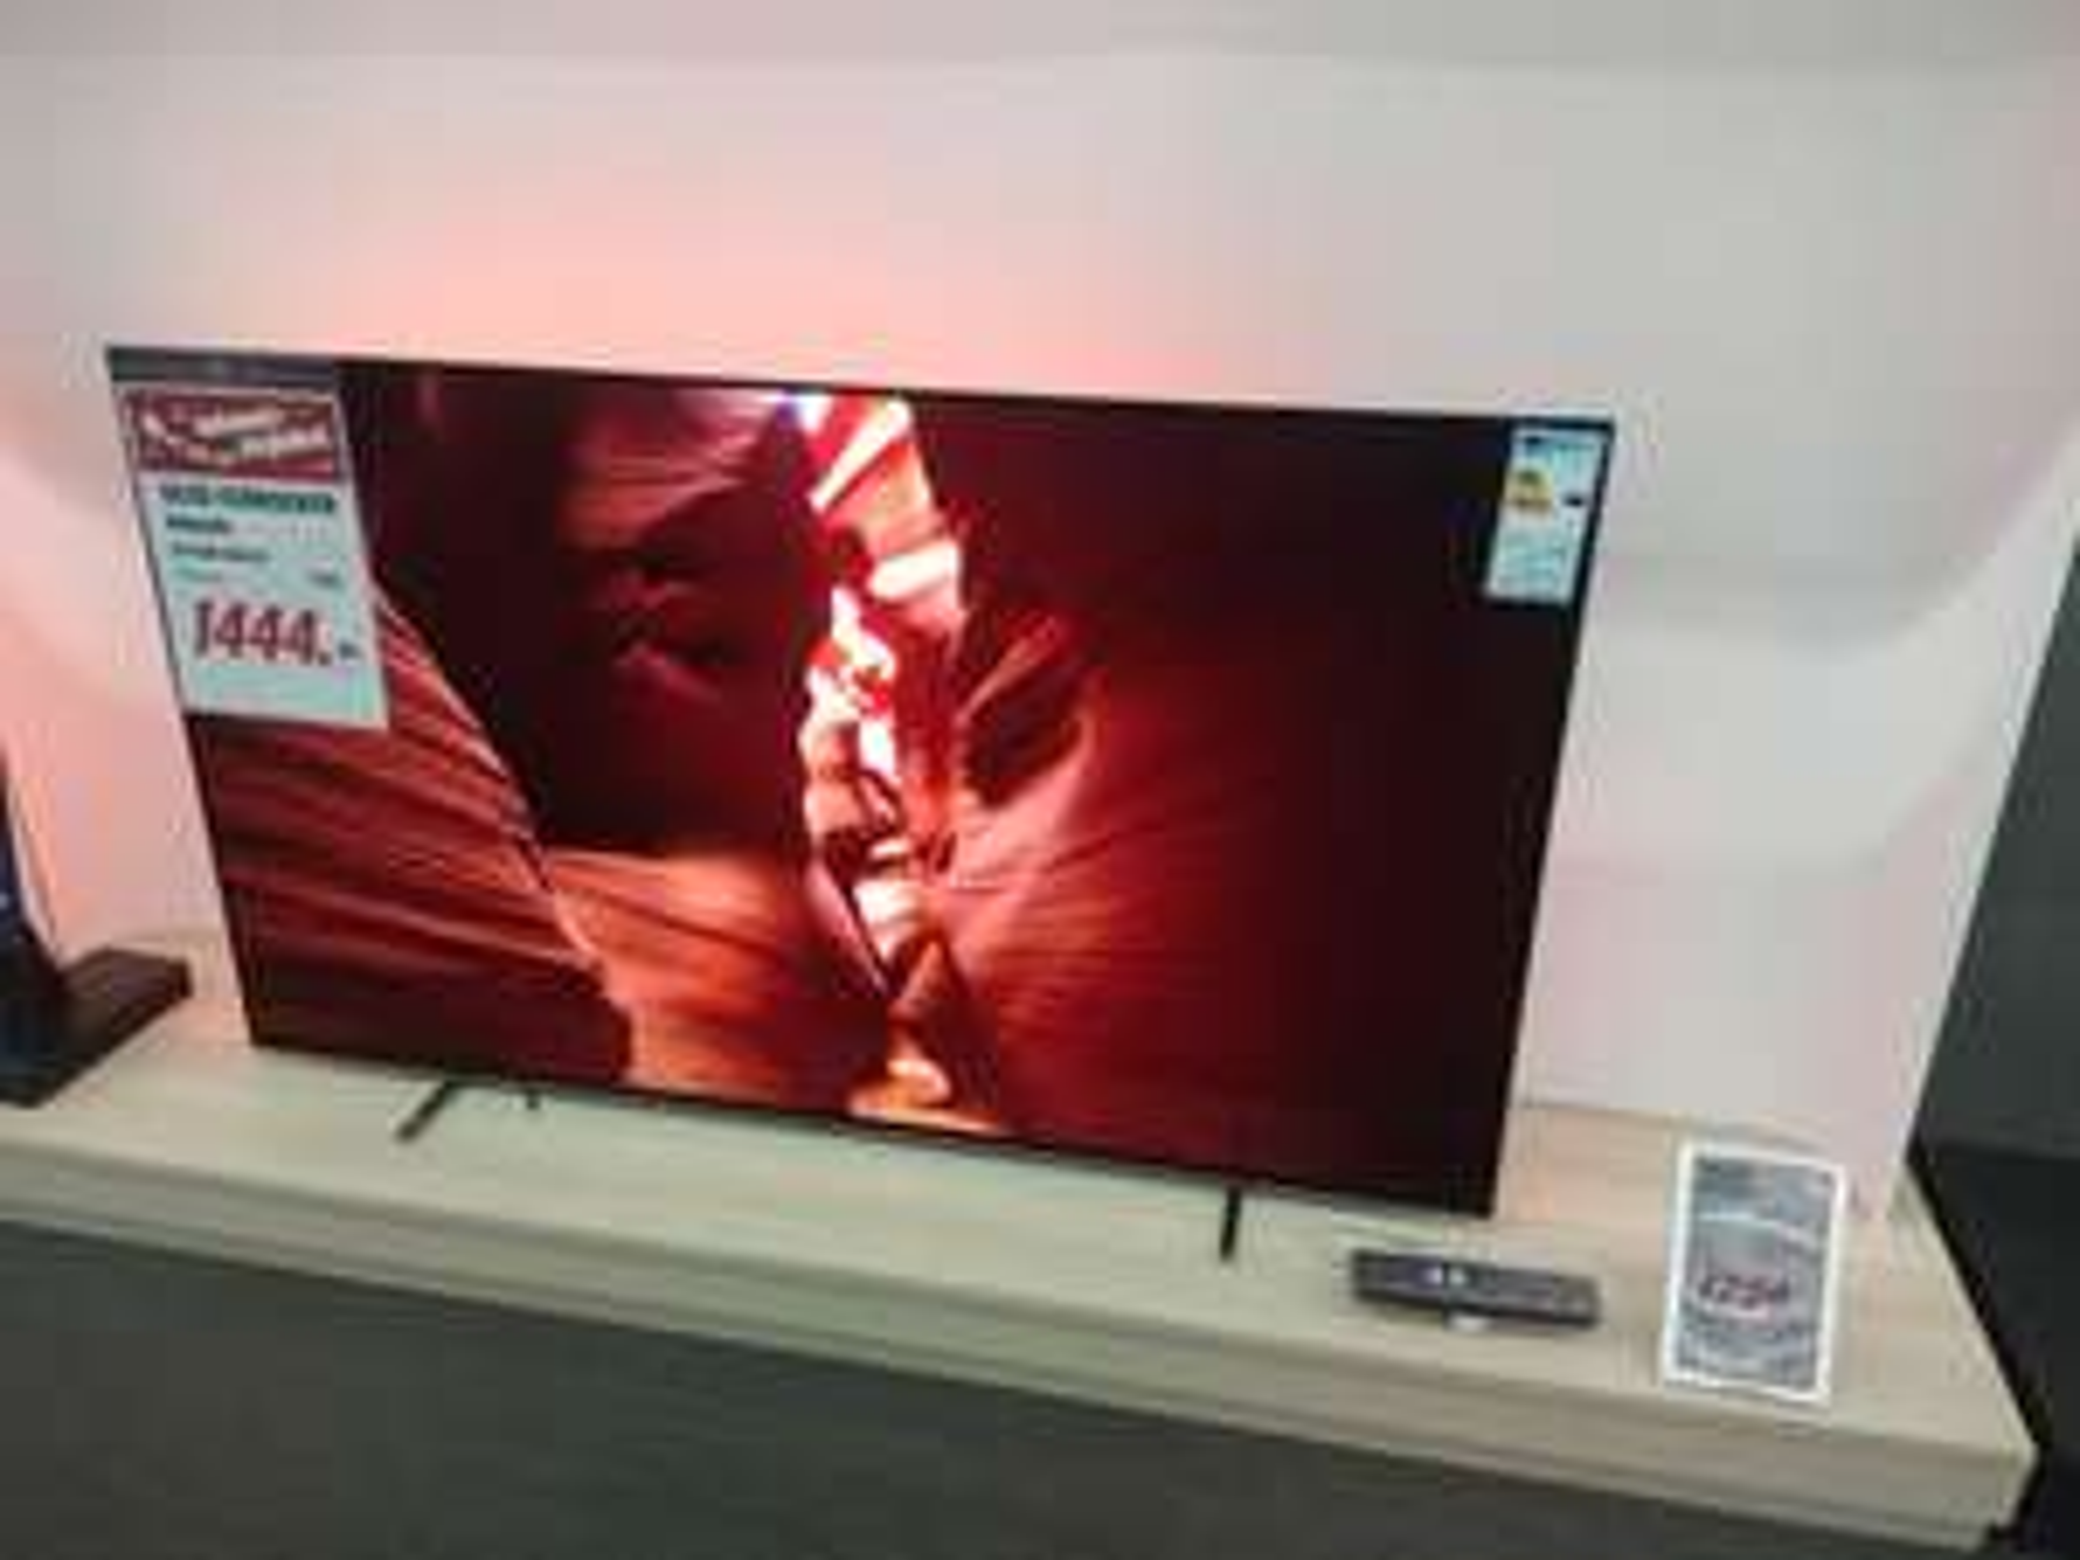 Philips 55 OLED 804/12 für €1444,00 im MM Tegel (Lokal: Berlin)